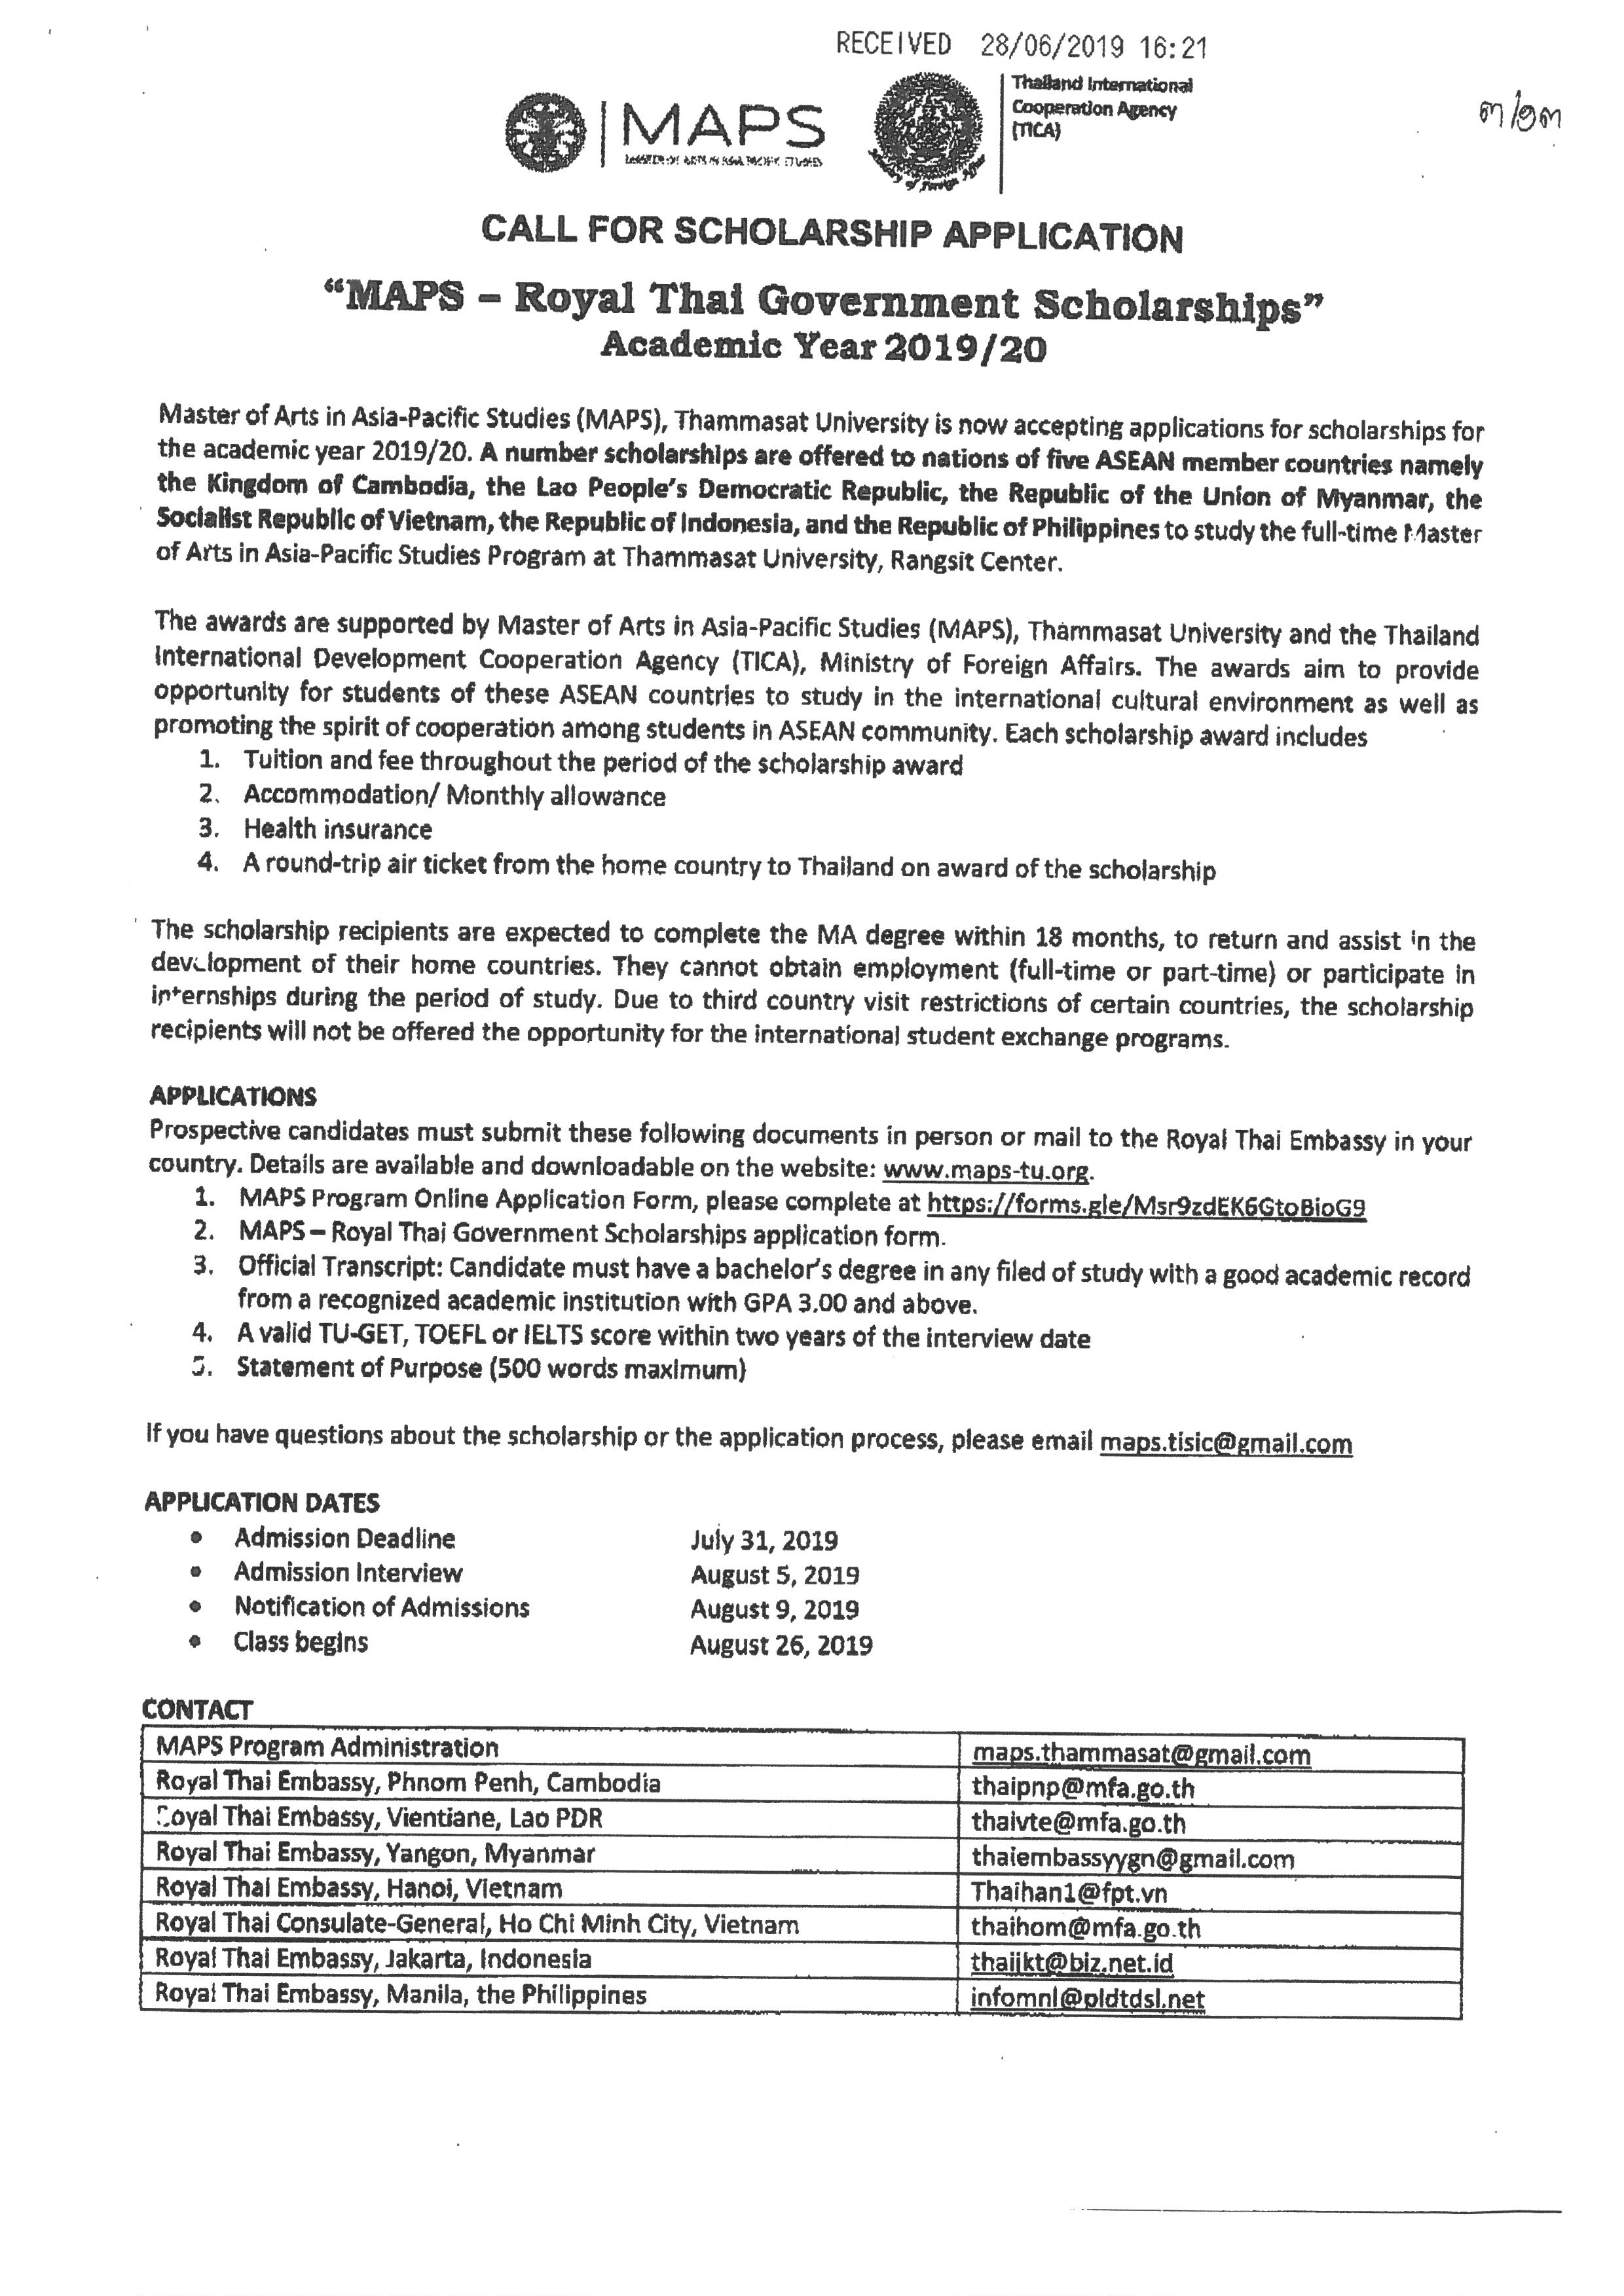 MAPS - Royal Thai Government Scholarships